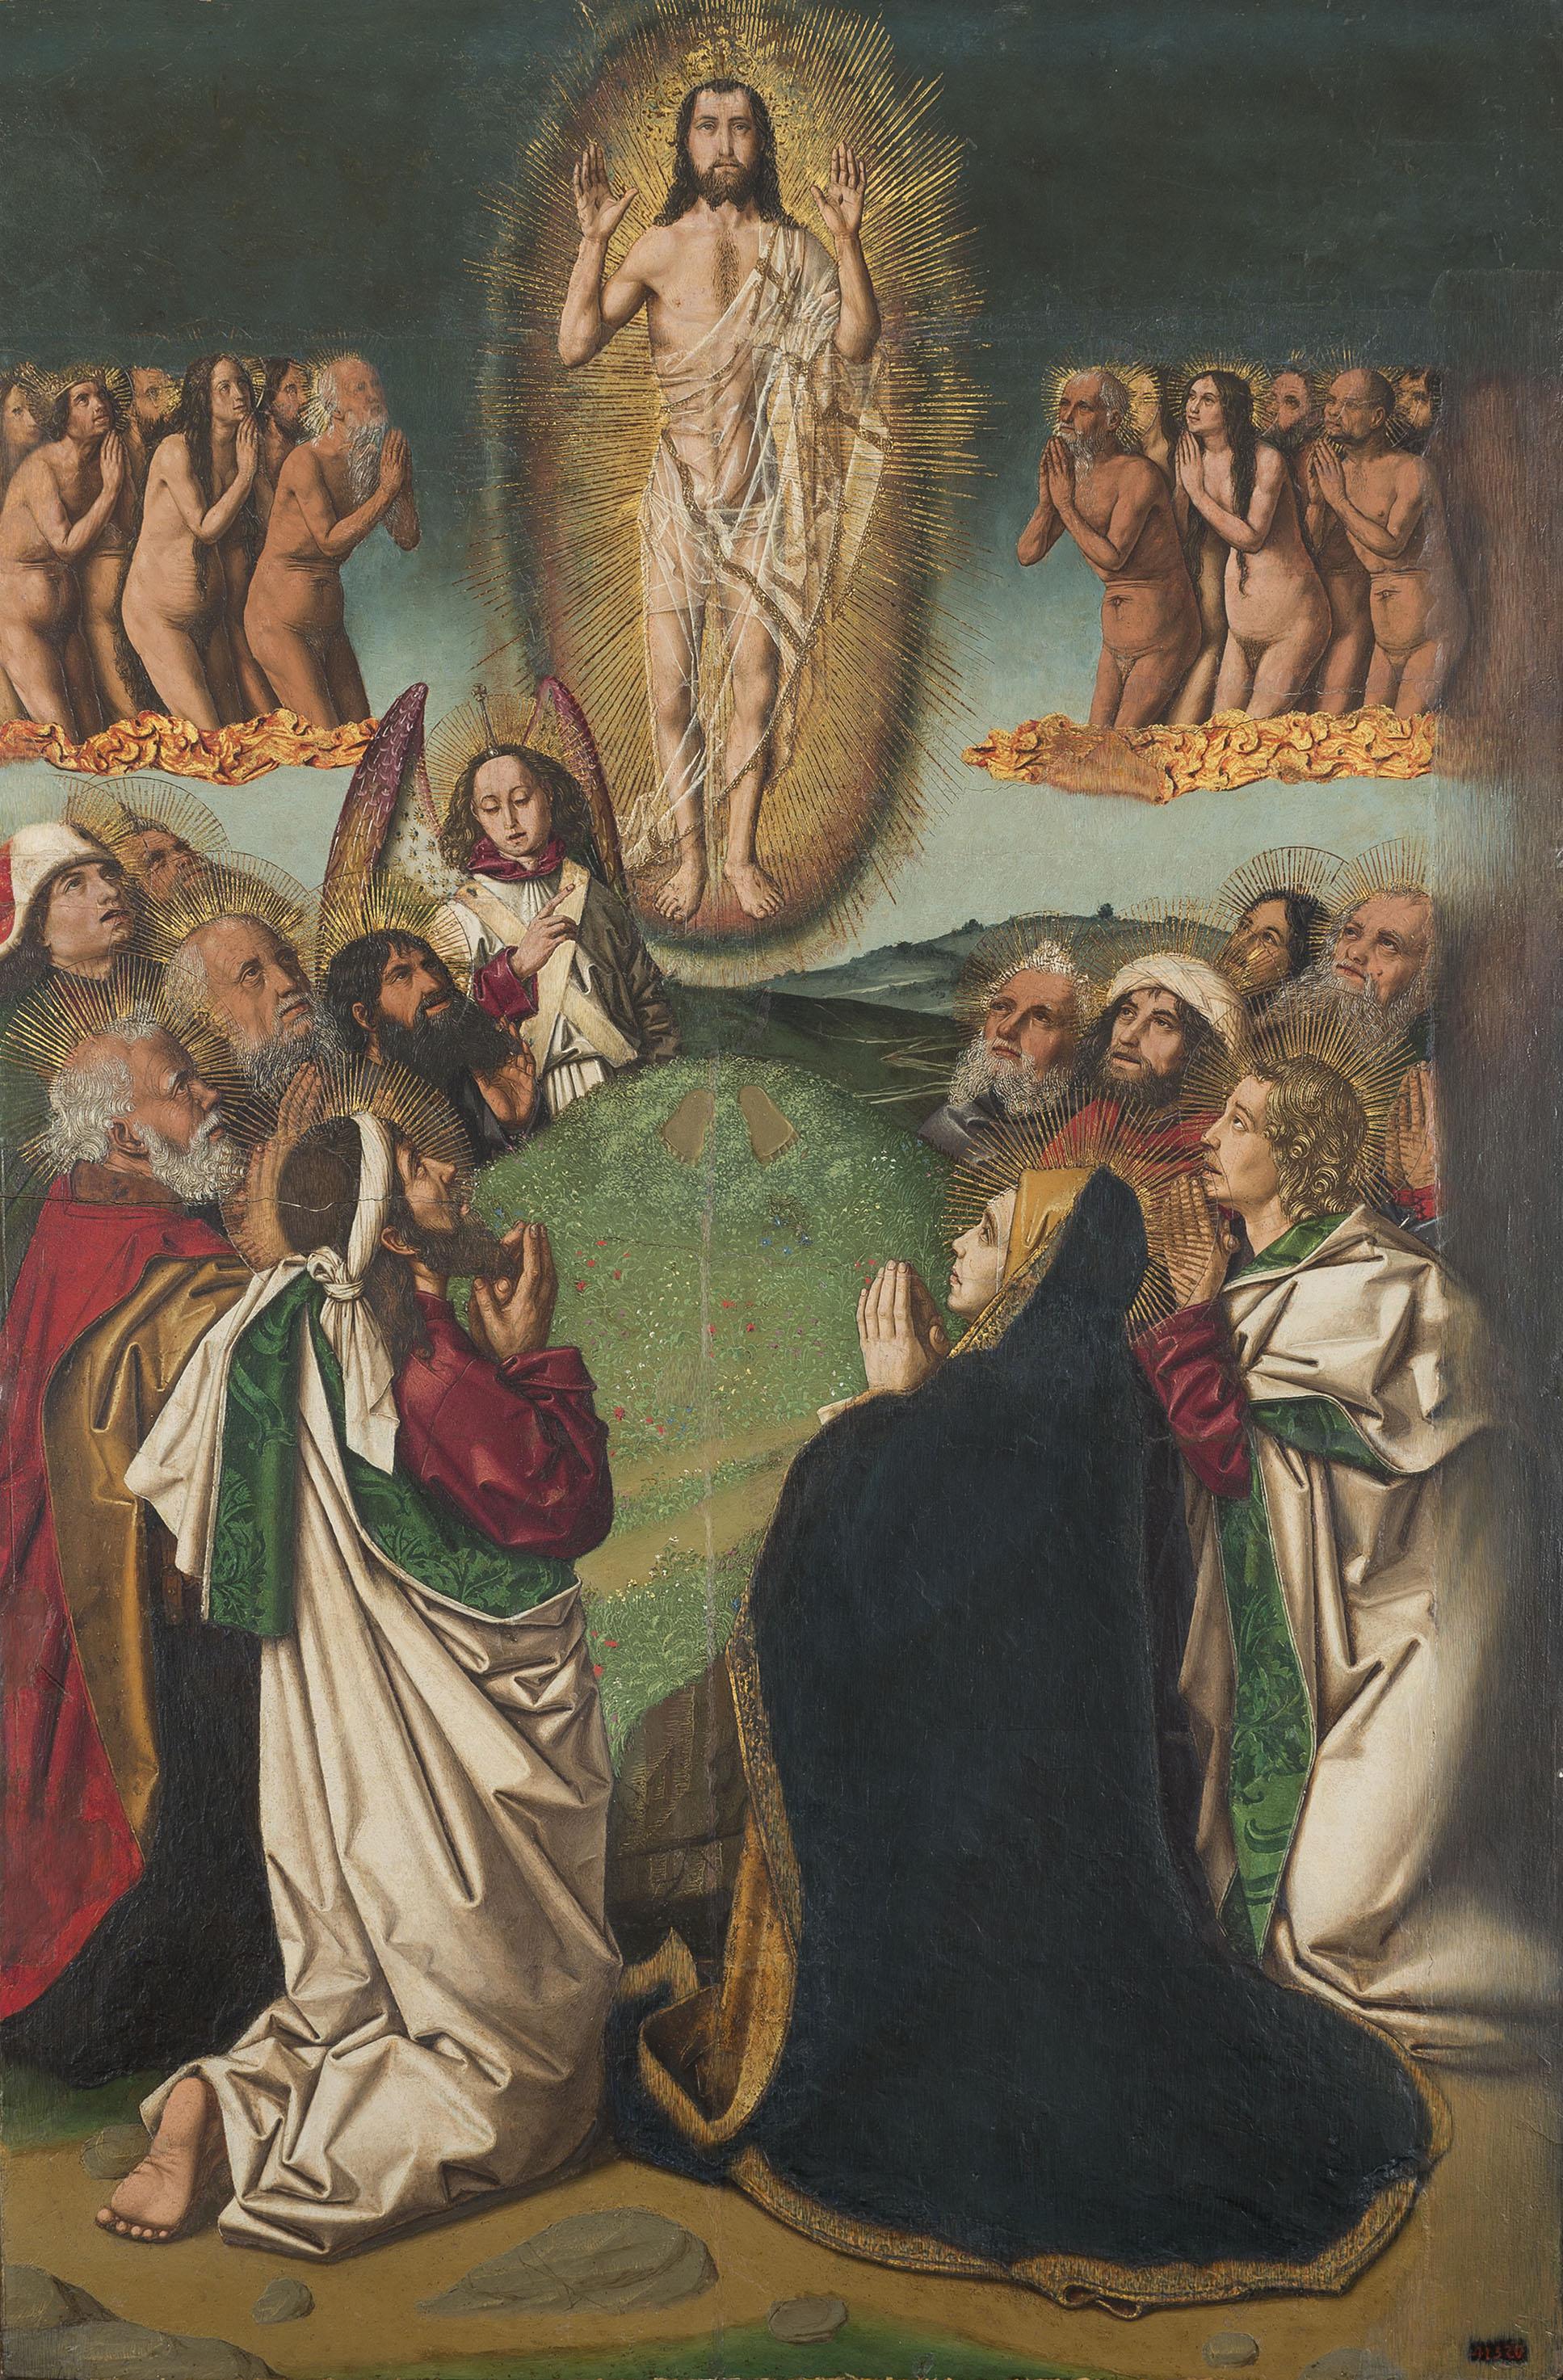 Bartolomé Bermejo - Ascension - Circa 1475